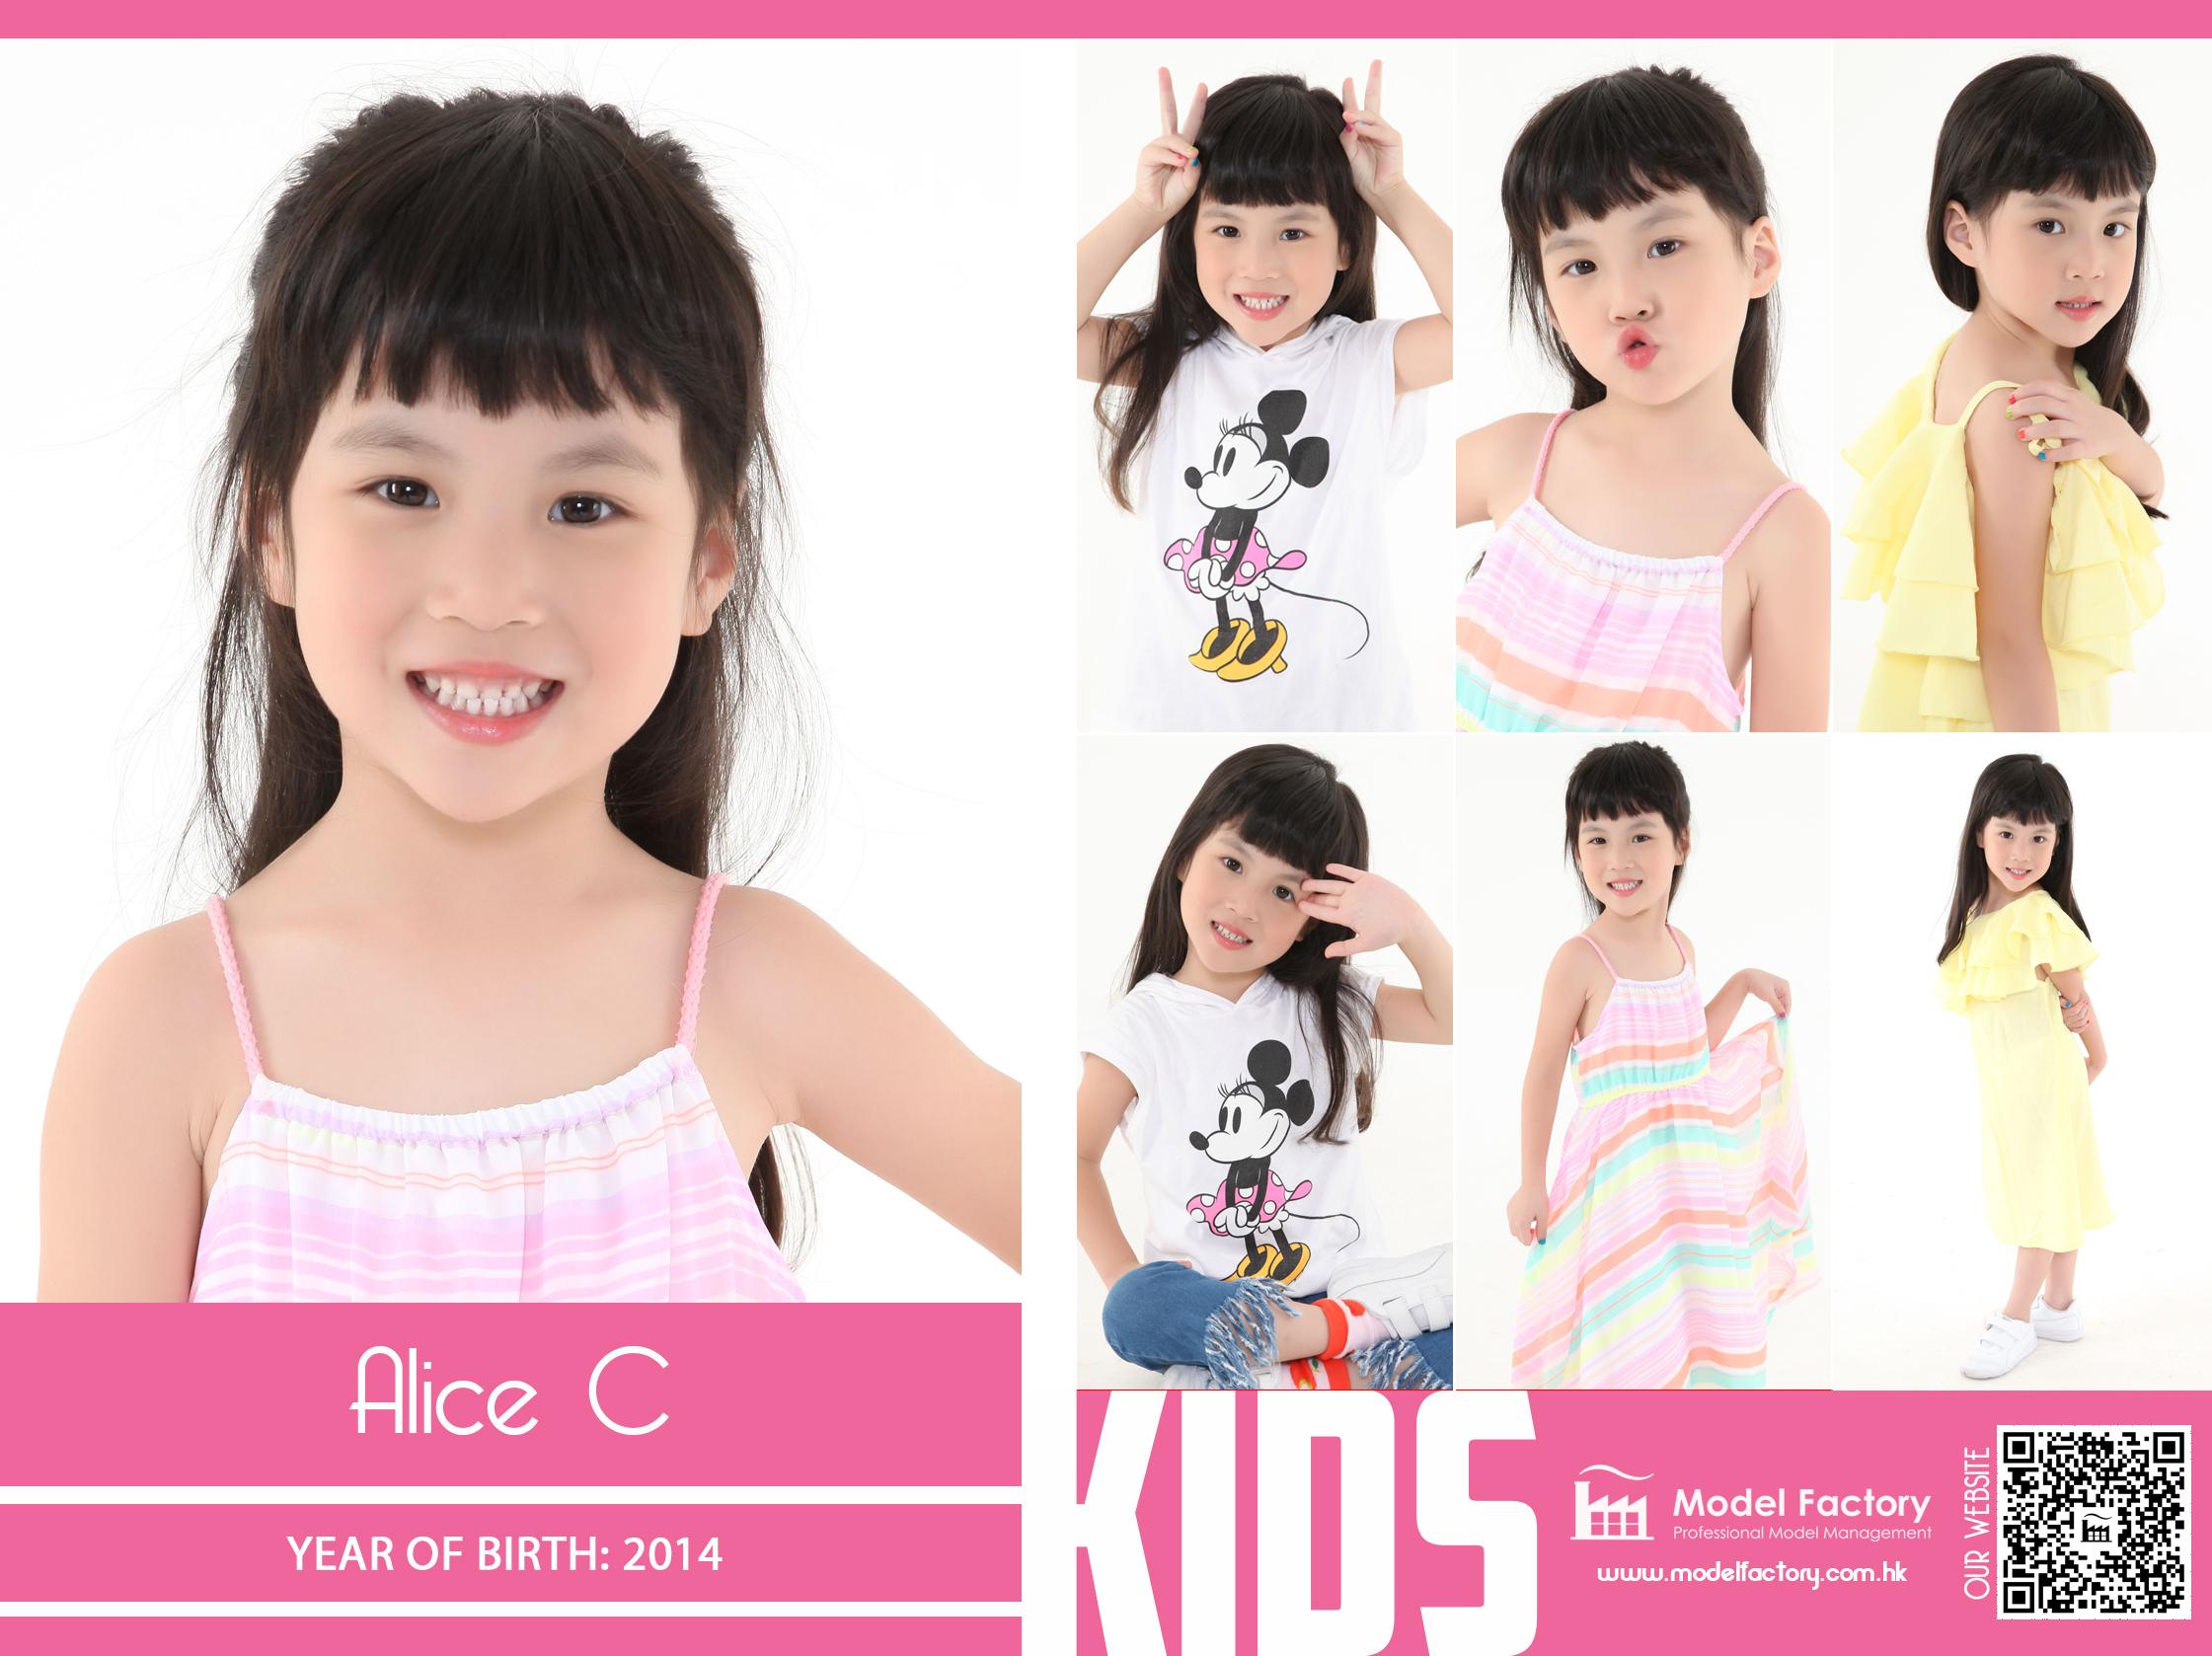 Model Factory Local Kids Model Alice C